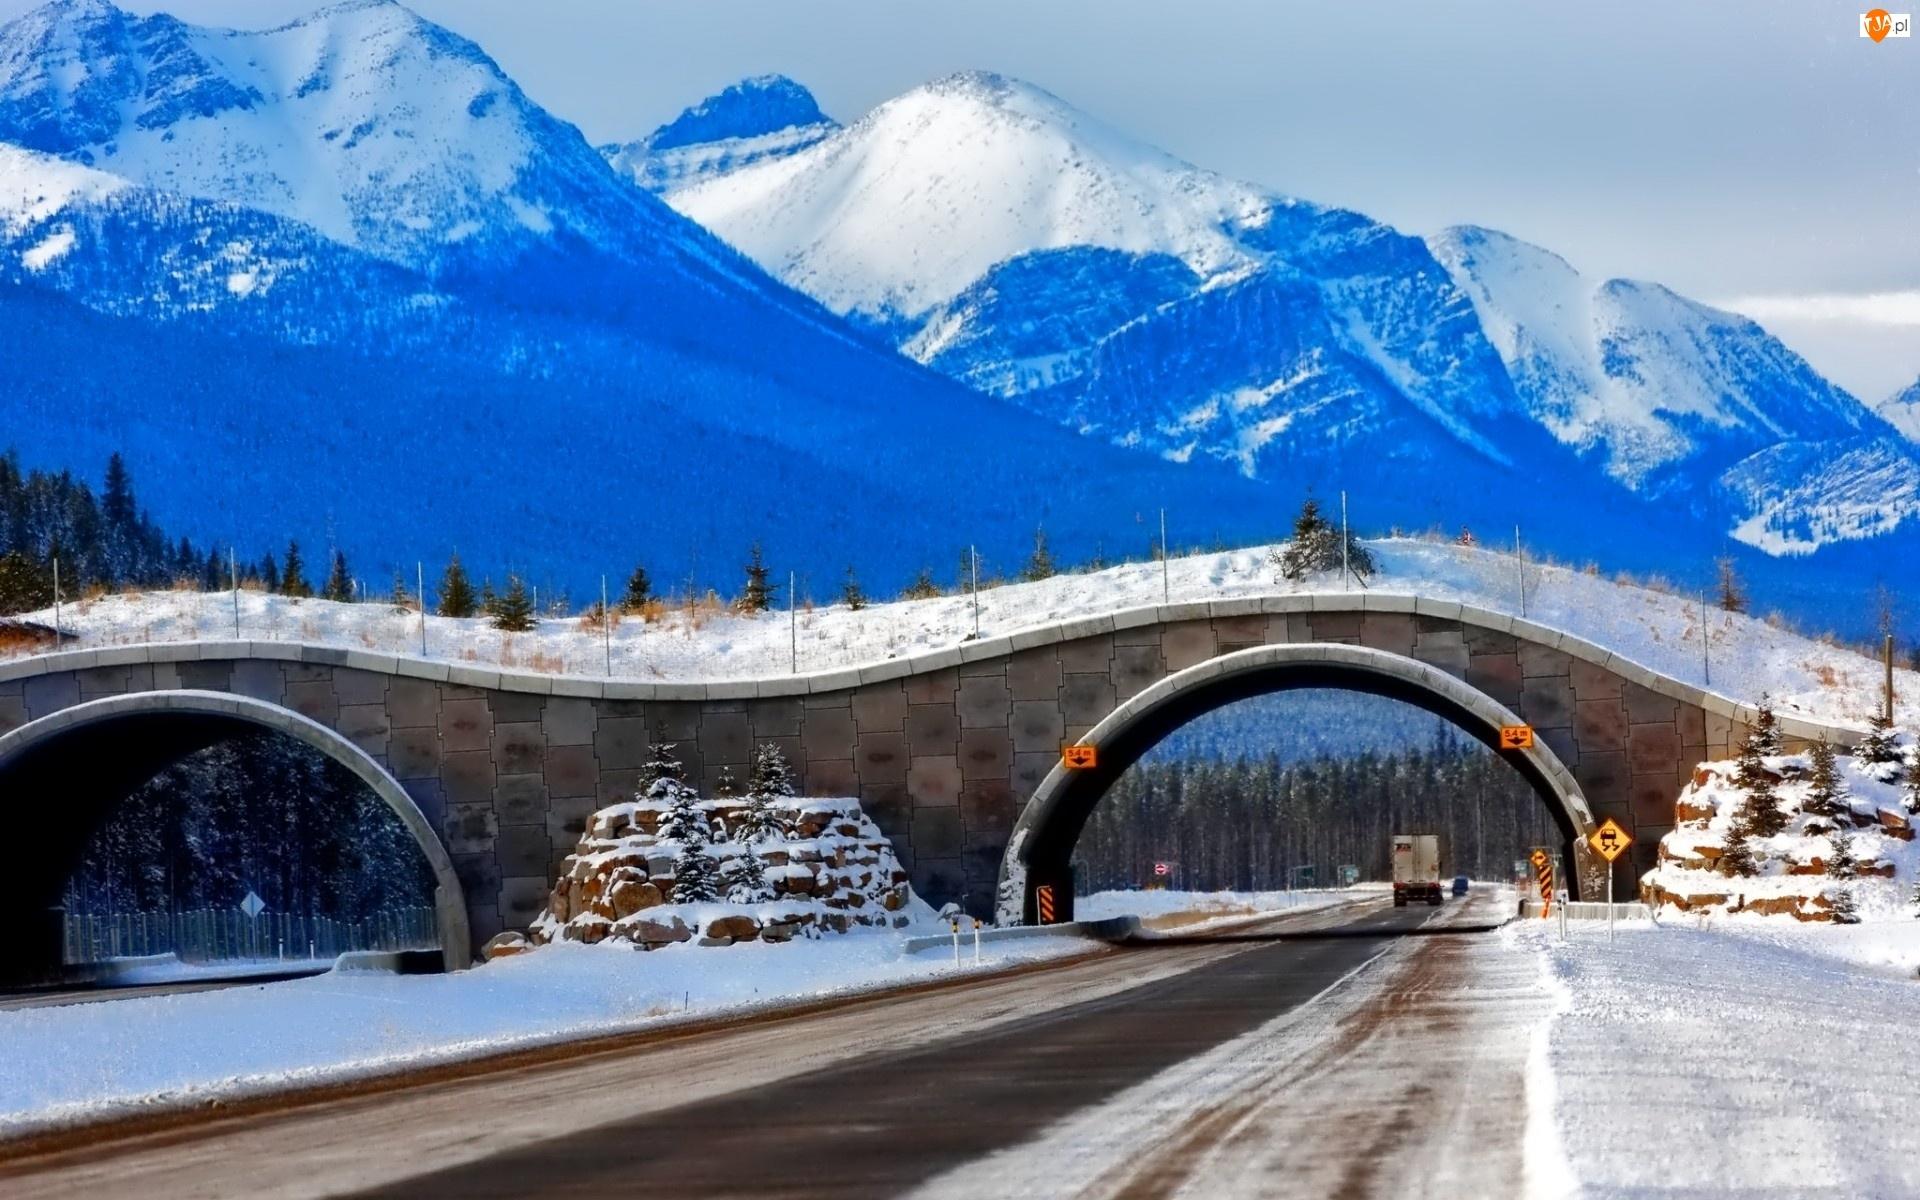 Zima, Droga, Góry, Tunele, Lasy